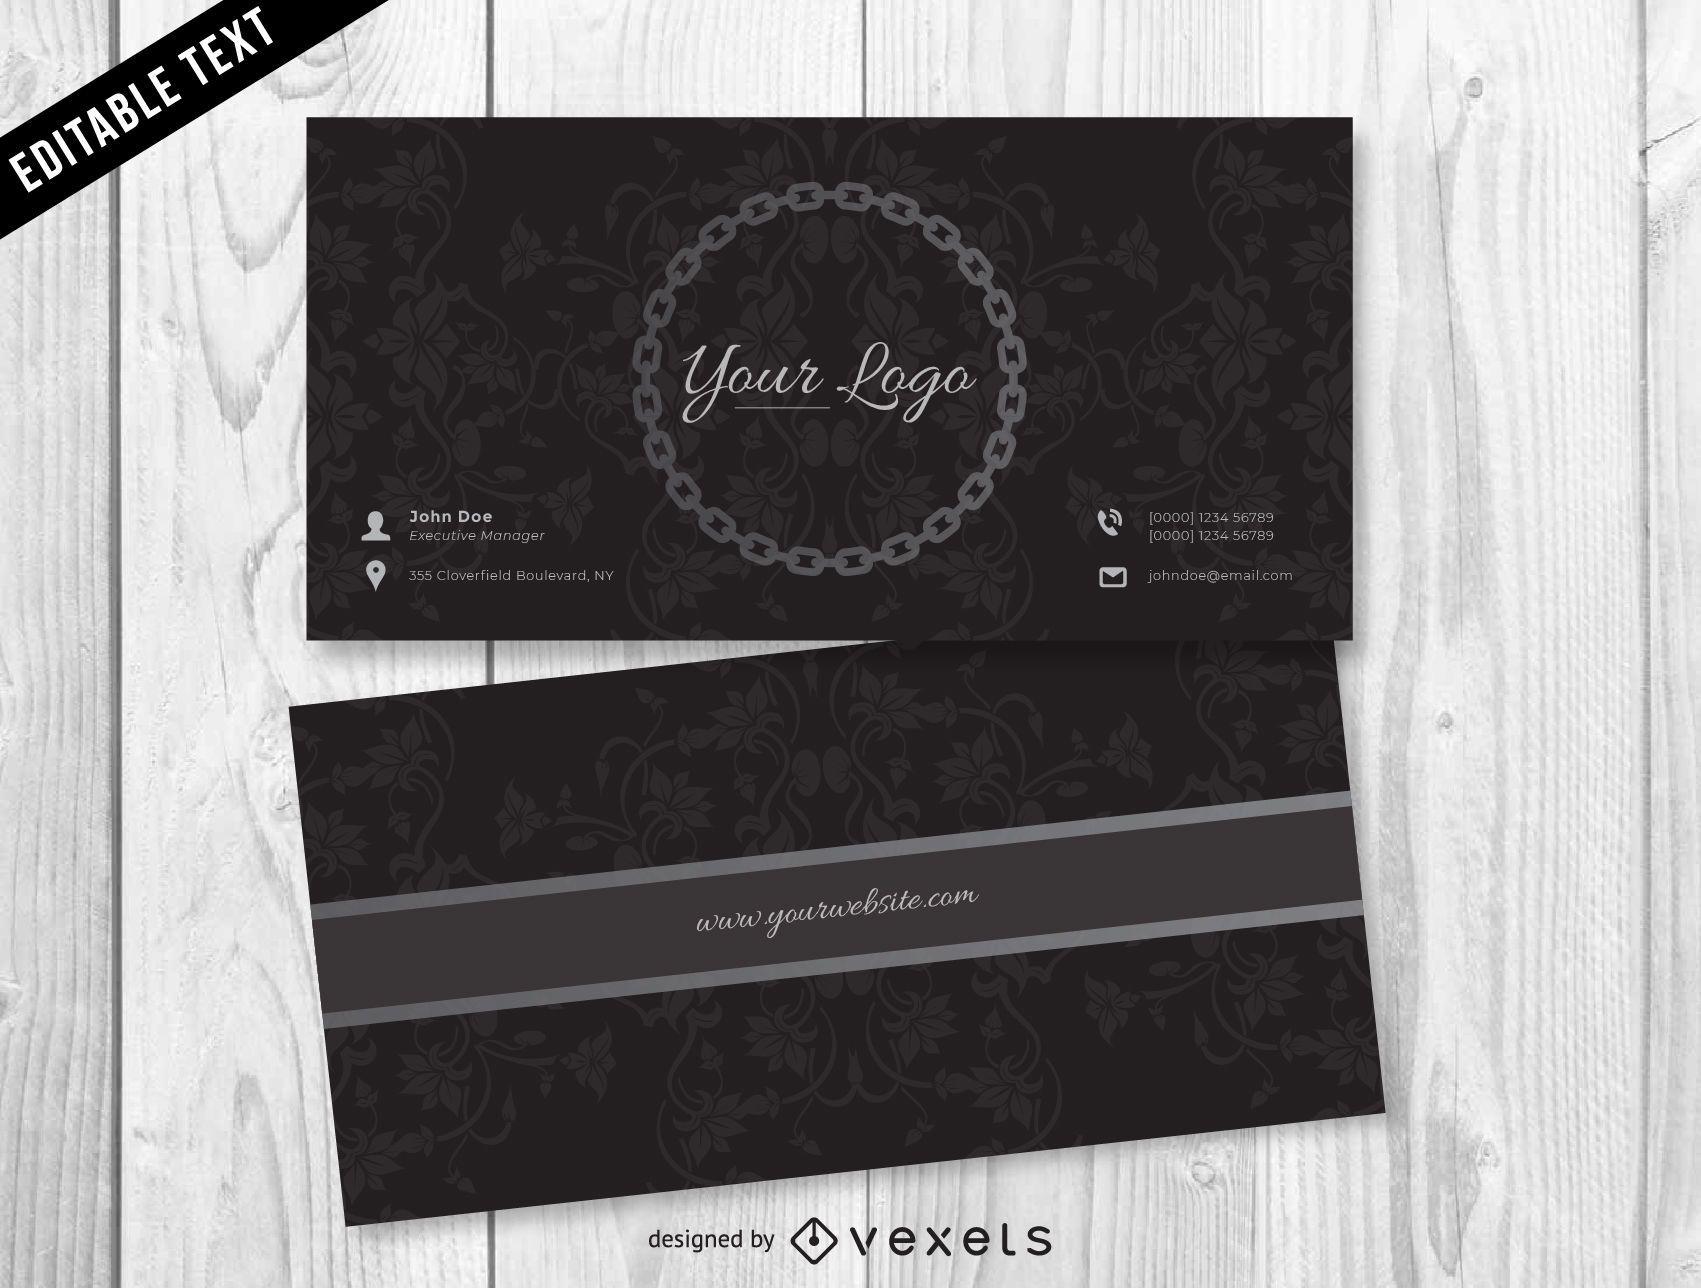 Dark Jewelry Business Card Design - Vector download